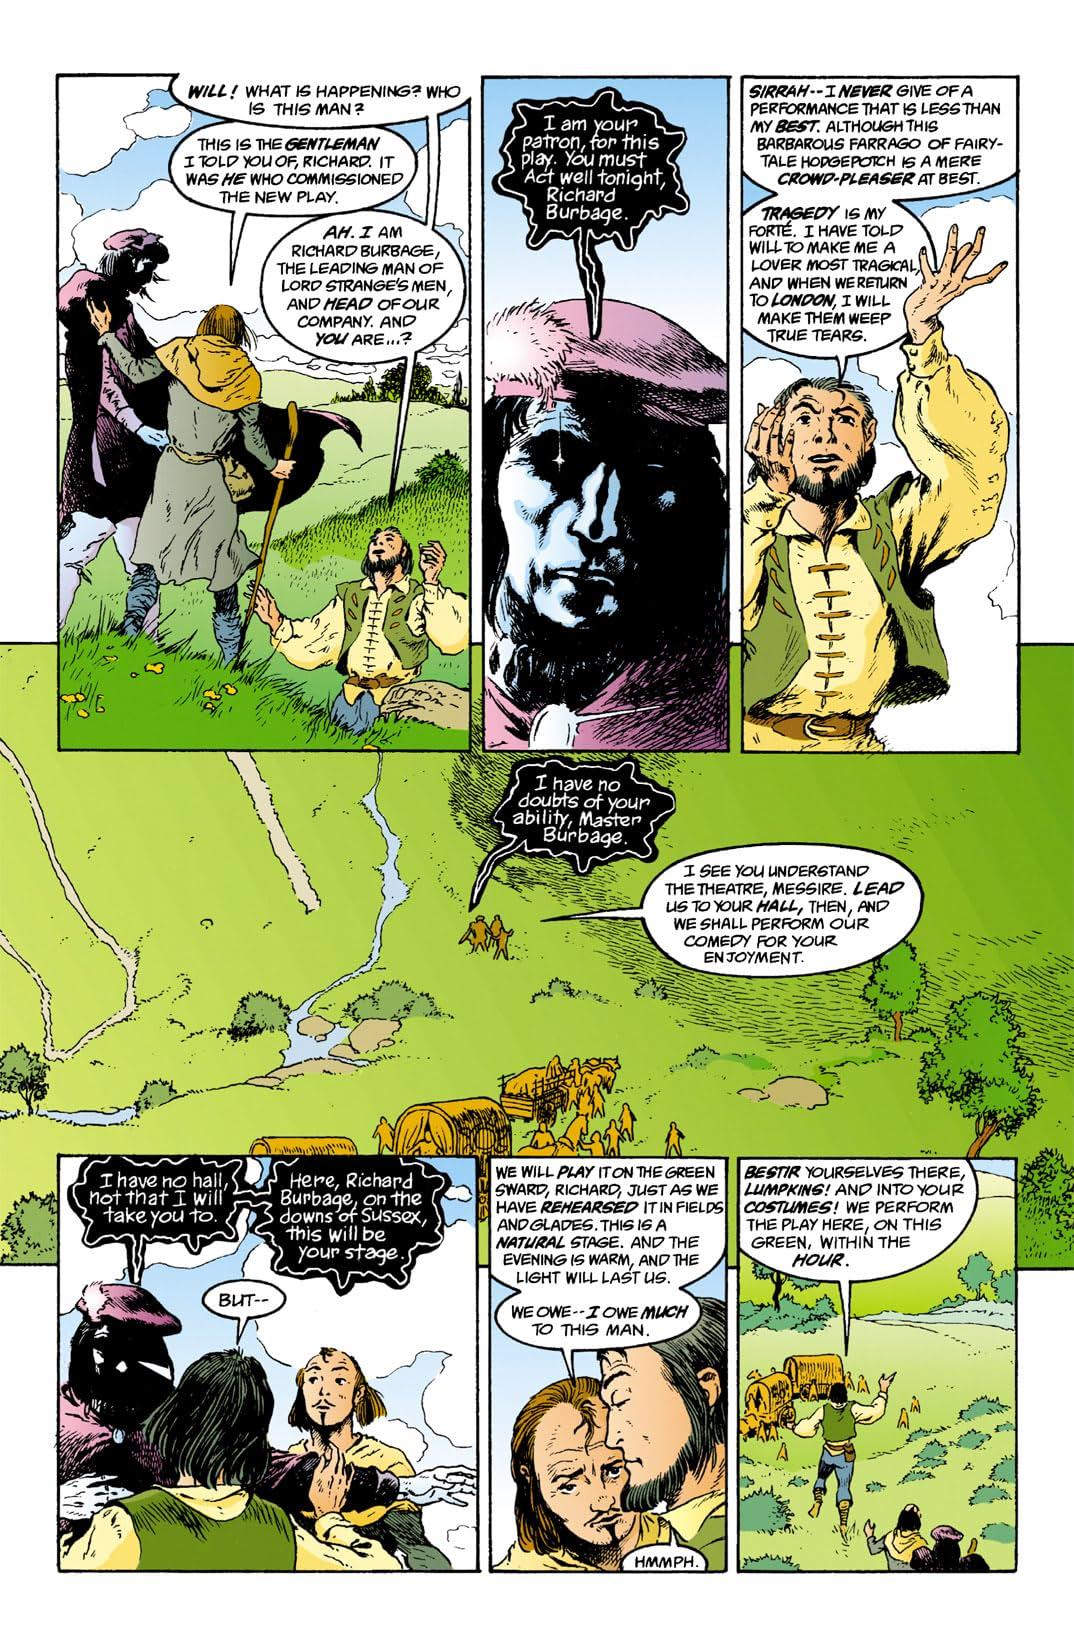 The Sandman #19